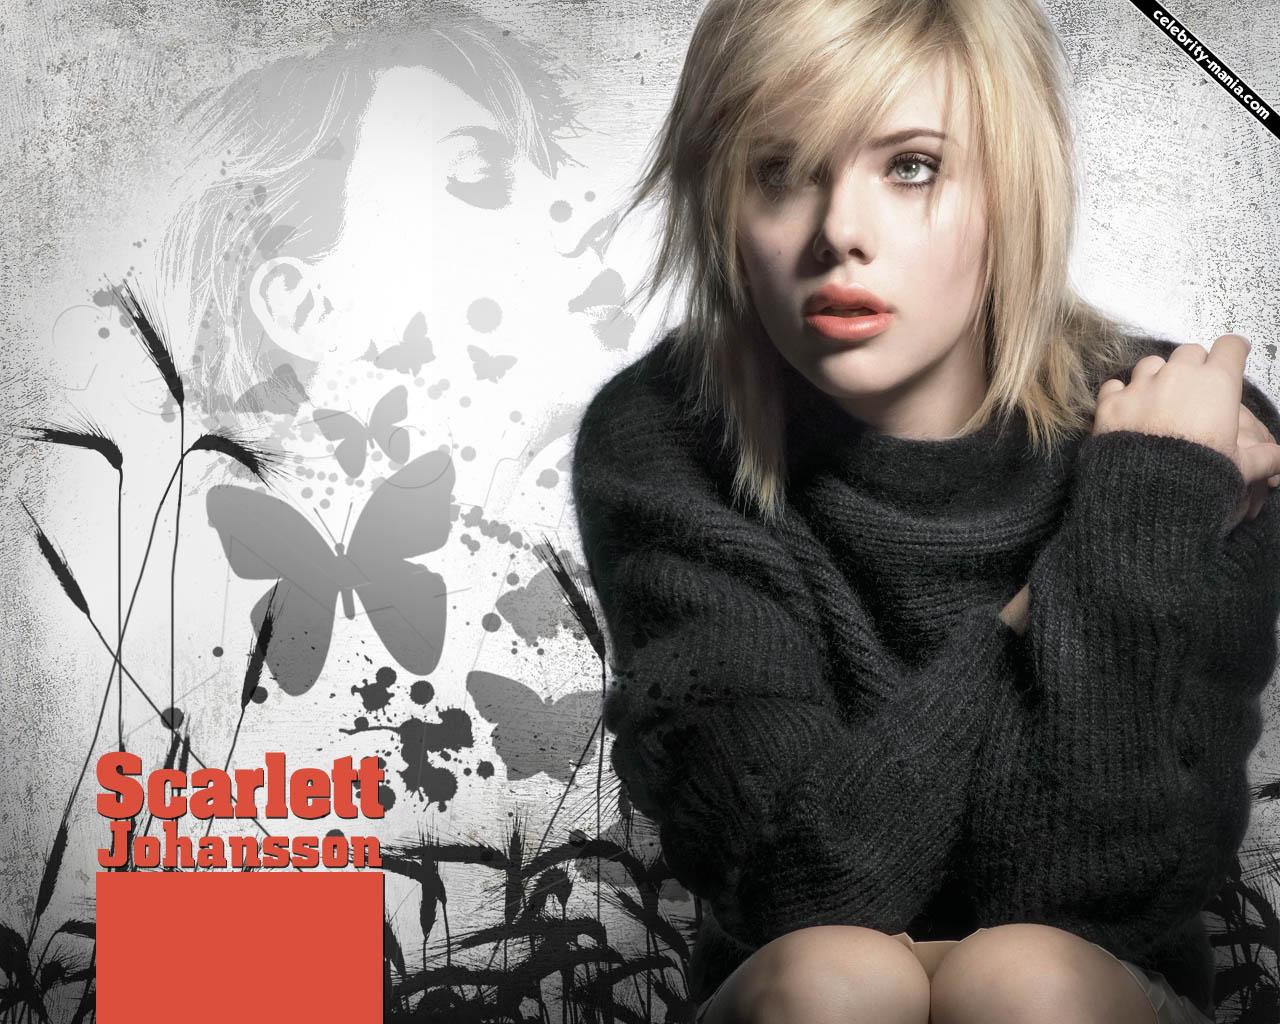 http://4.bp.blogspot.com/_vInxv5Jewfo/TE4ISPAvjoI/AAAAAAAAAIo/FBQuab1_57k/s1600/Scarlett+Johansson+-+Wallpaper+(1).jpg